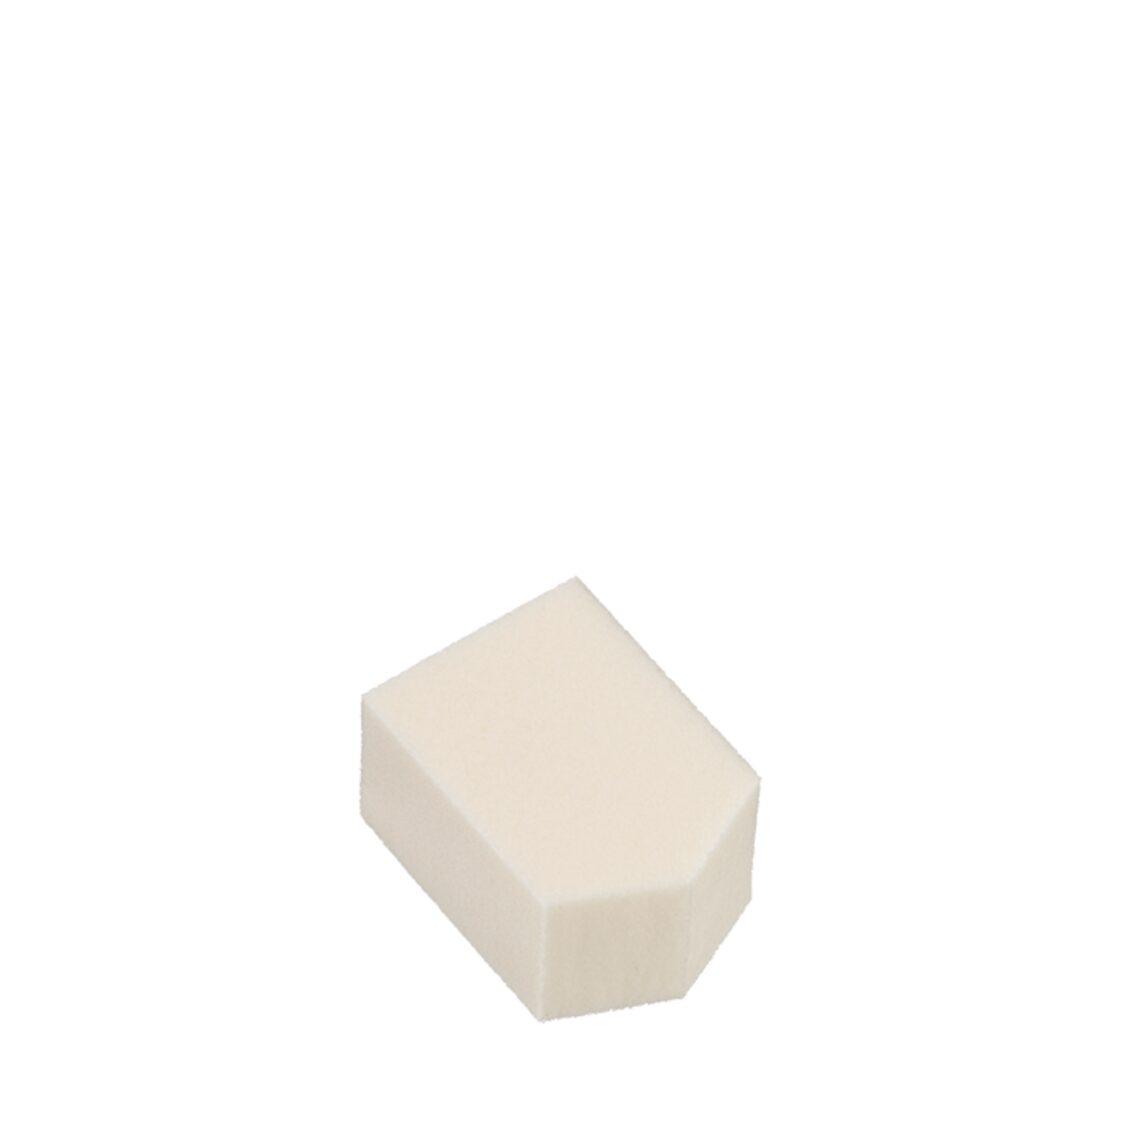 Shu Uemura Pentagon Brush Sponge